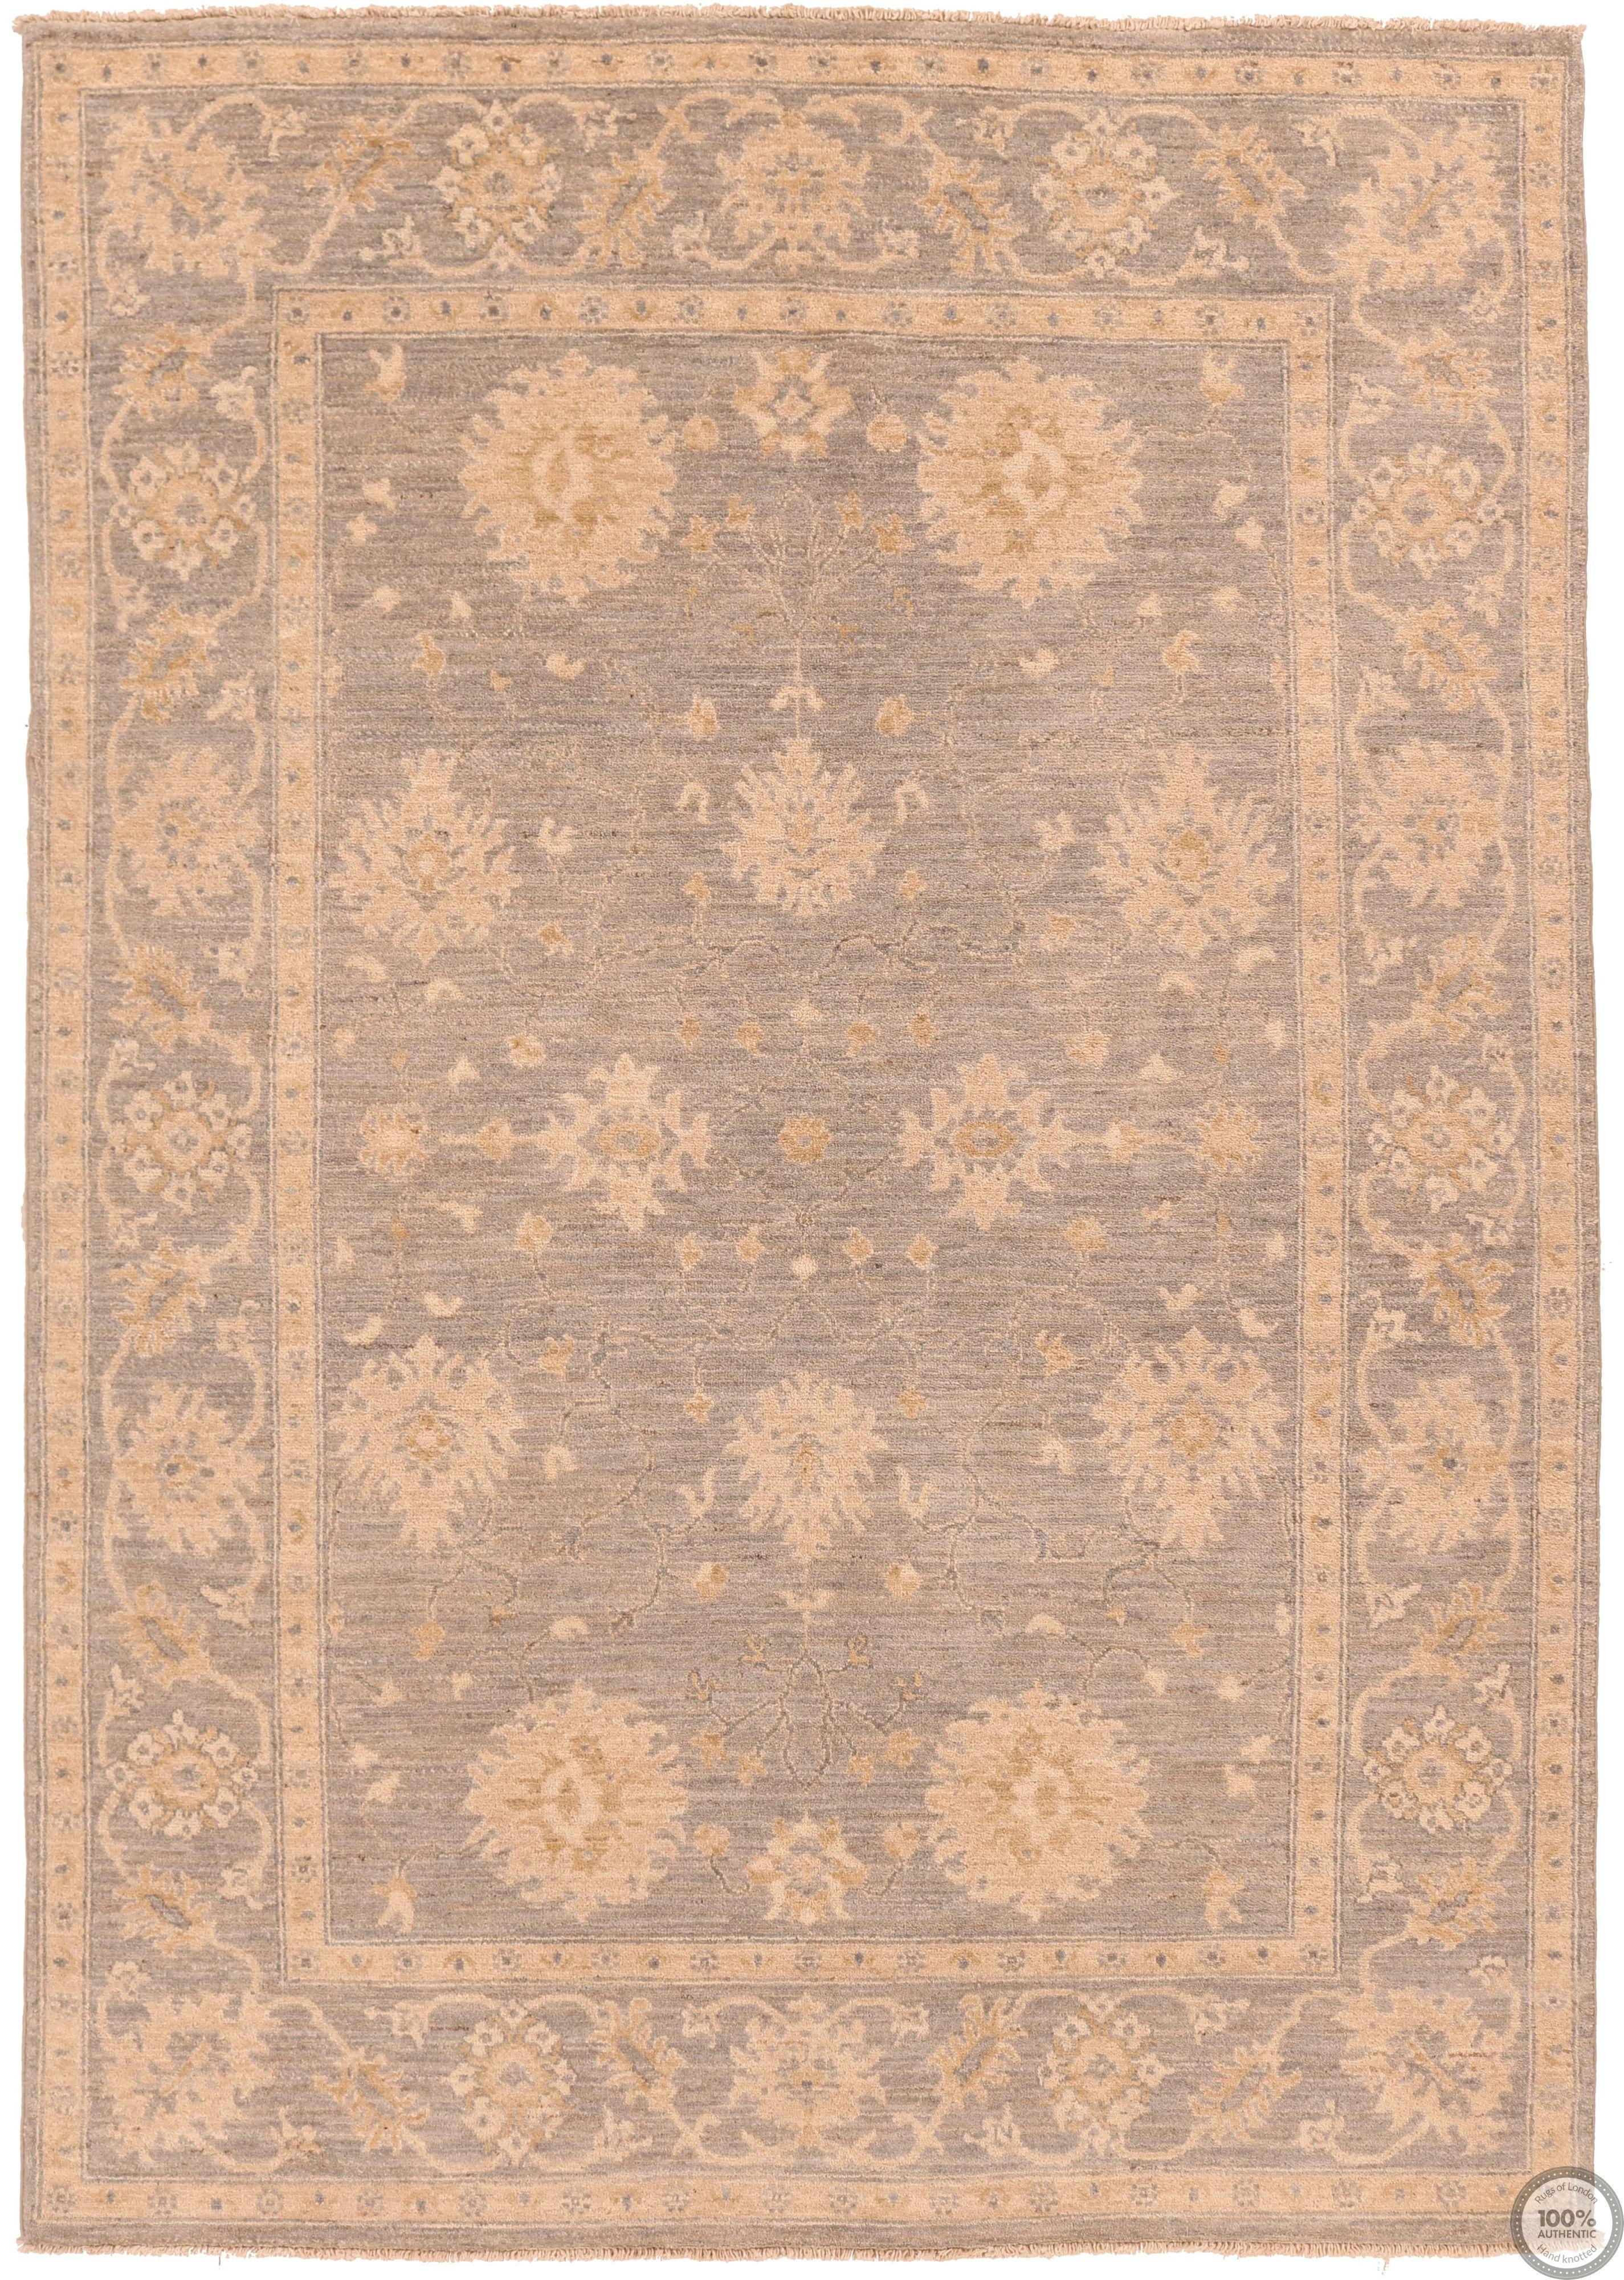 Garous Ziegler design rug 7'8 x 5'4